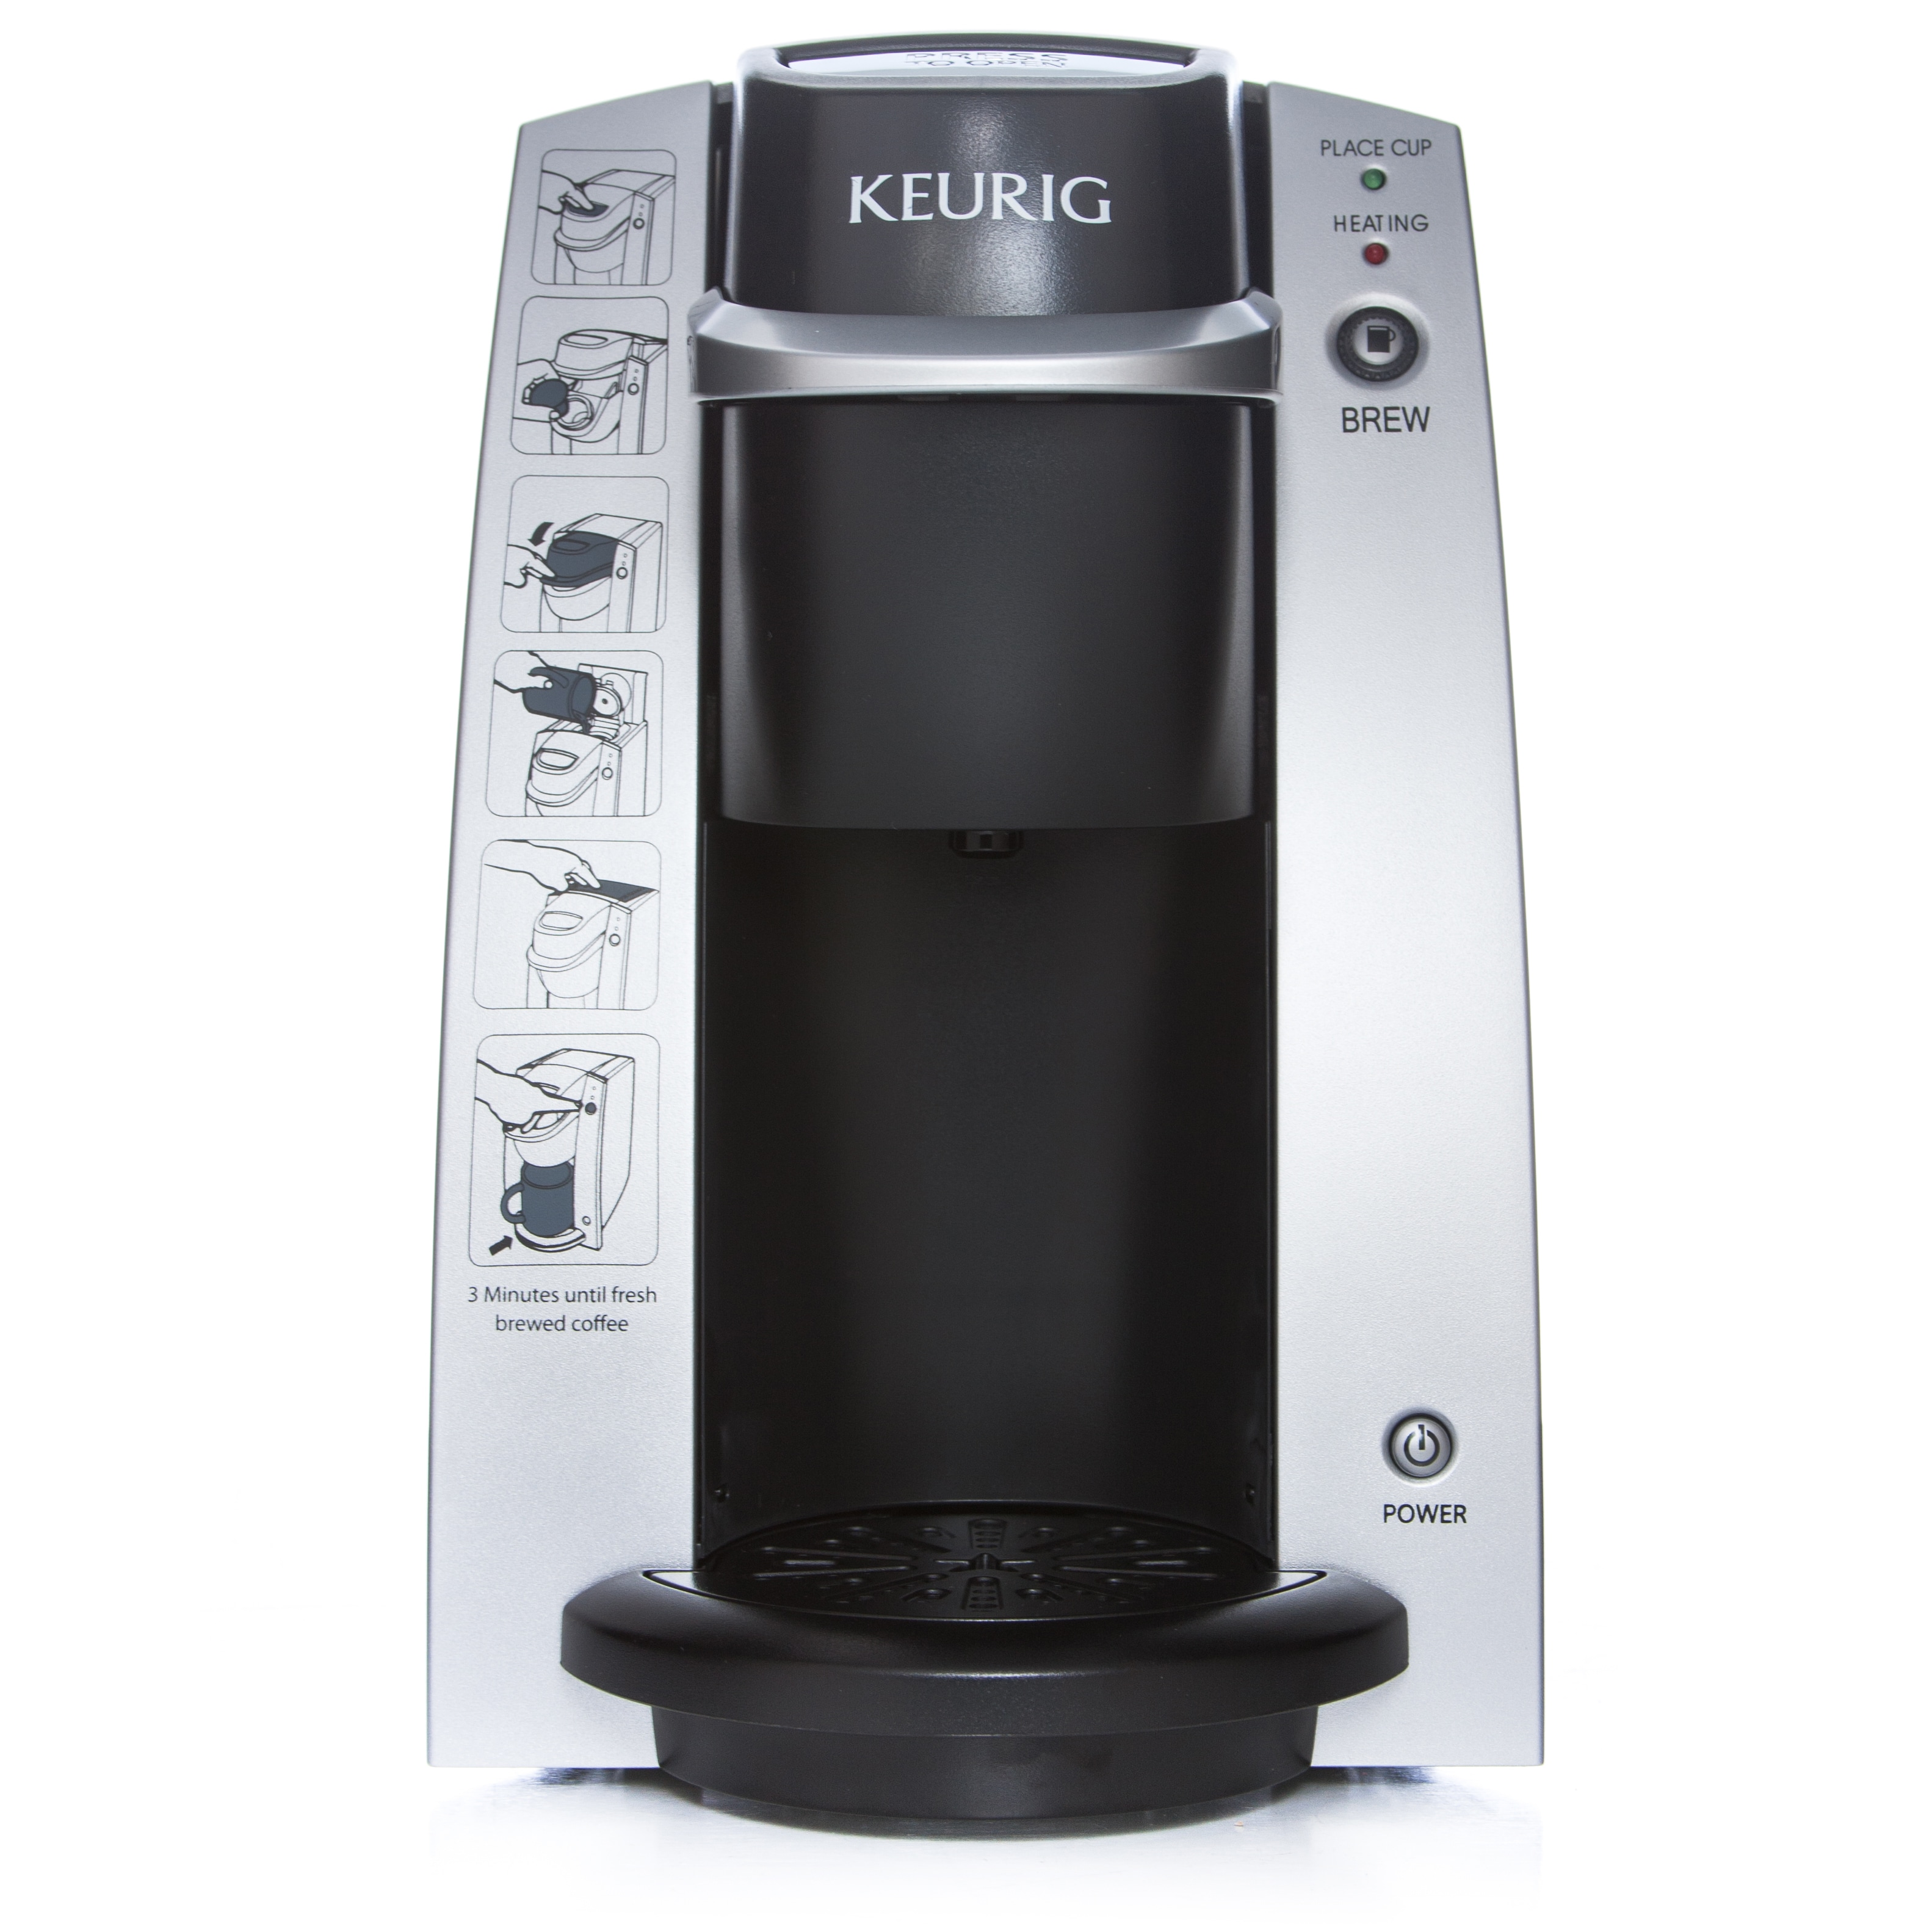 KEURIG K130 DeskPro Coffee Maker (Coffee Maker Only), Sil...